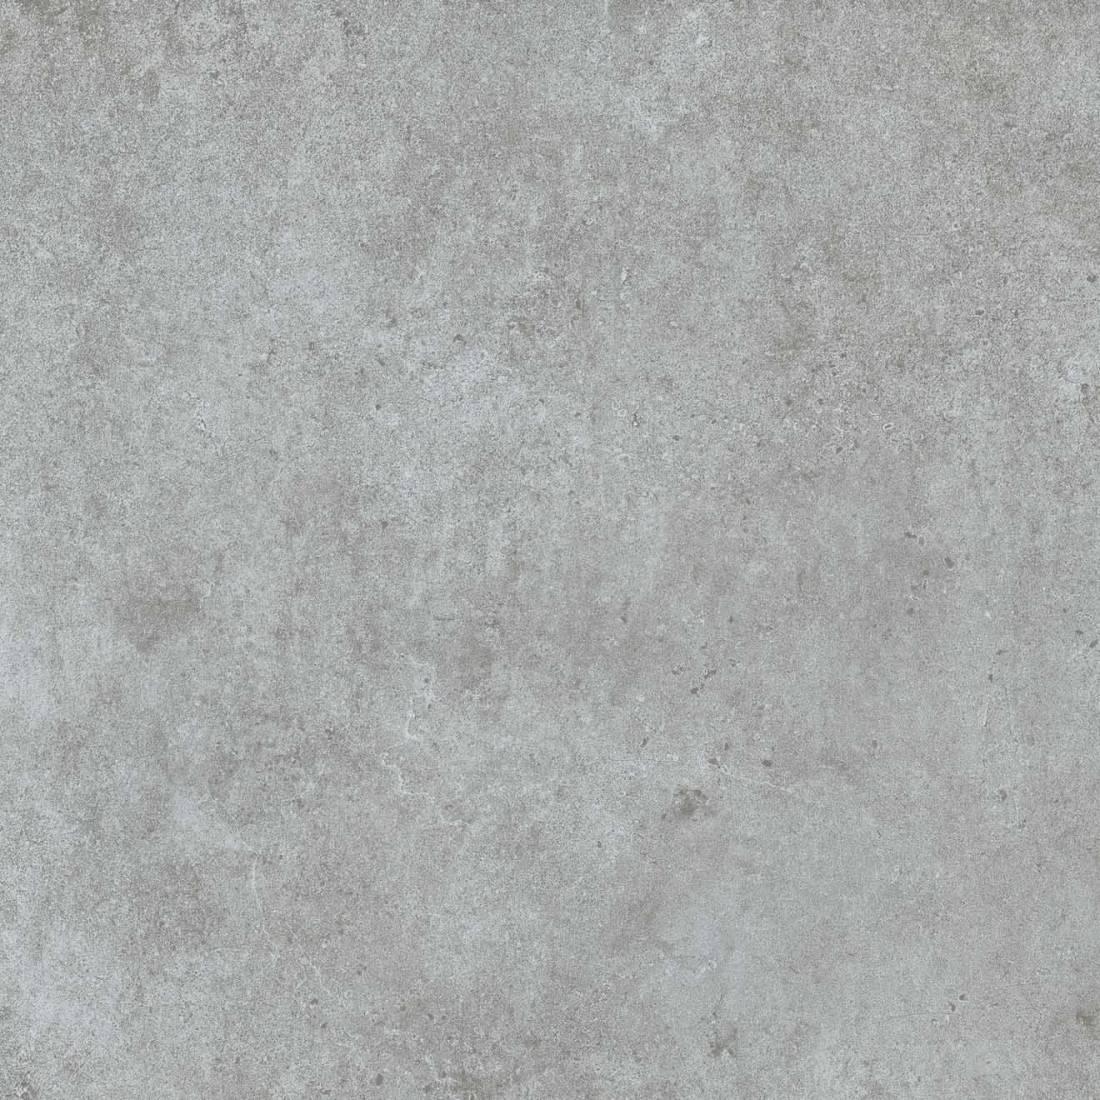 Belgravia 47x47 Gris Matt 1